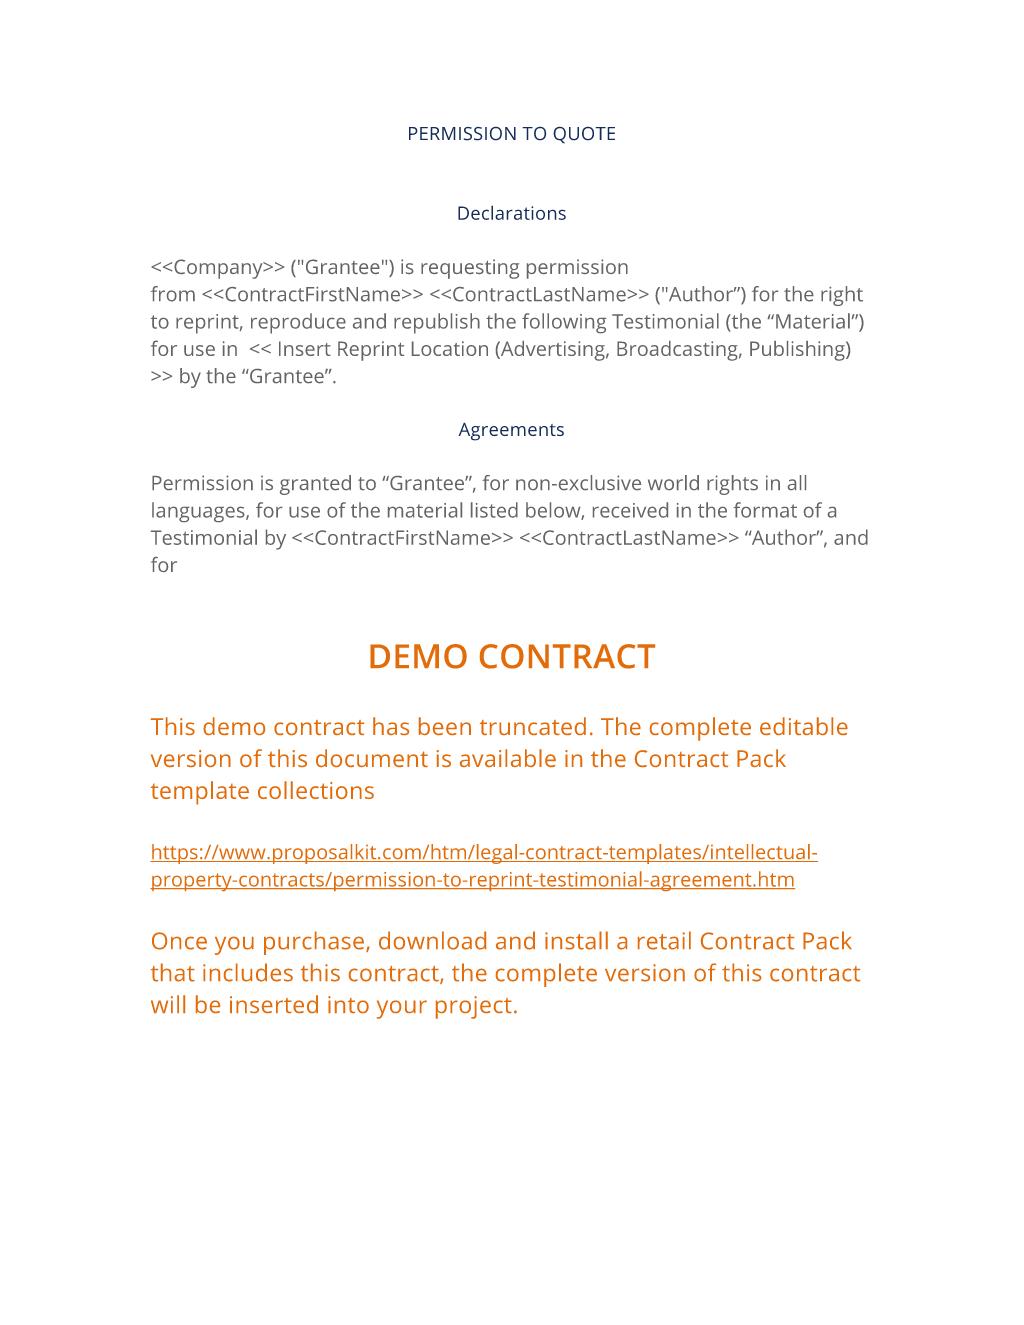 Permission To Reprint Testimonial Agreement 3 Easy Steps